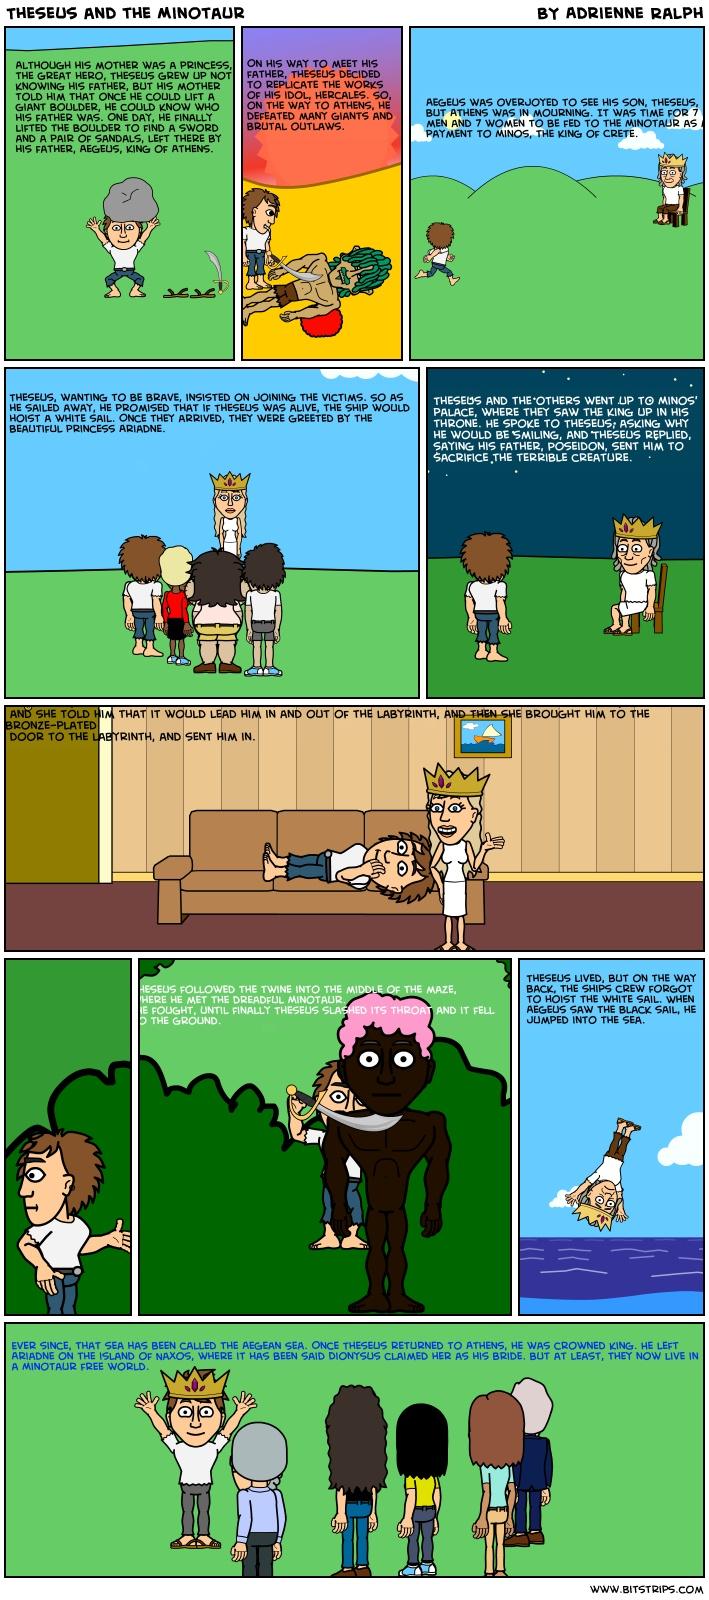 theseus and the minotaur game